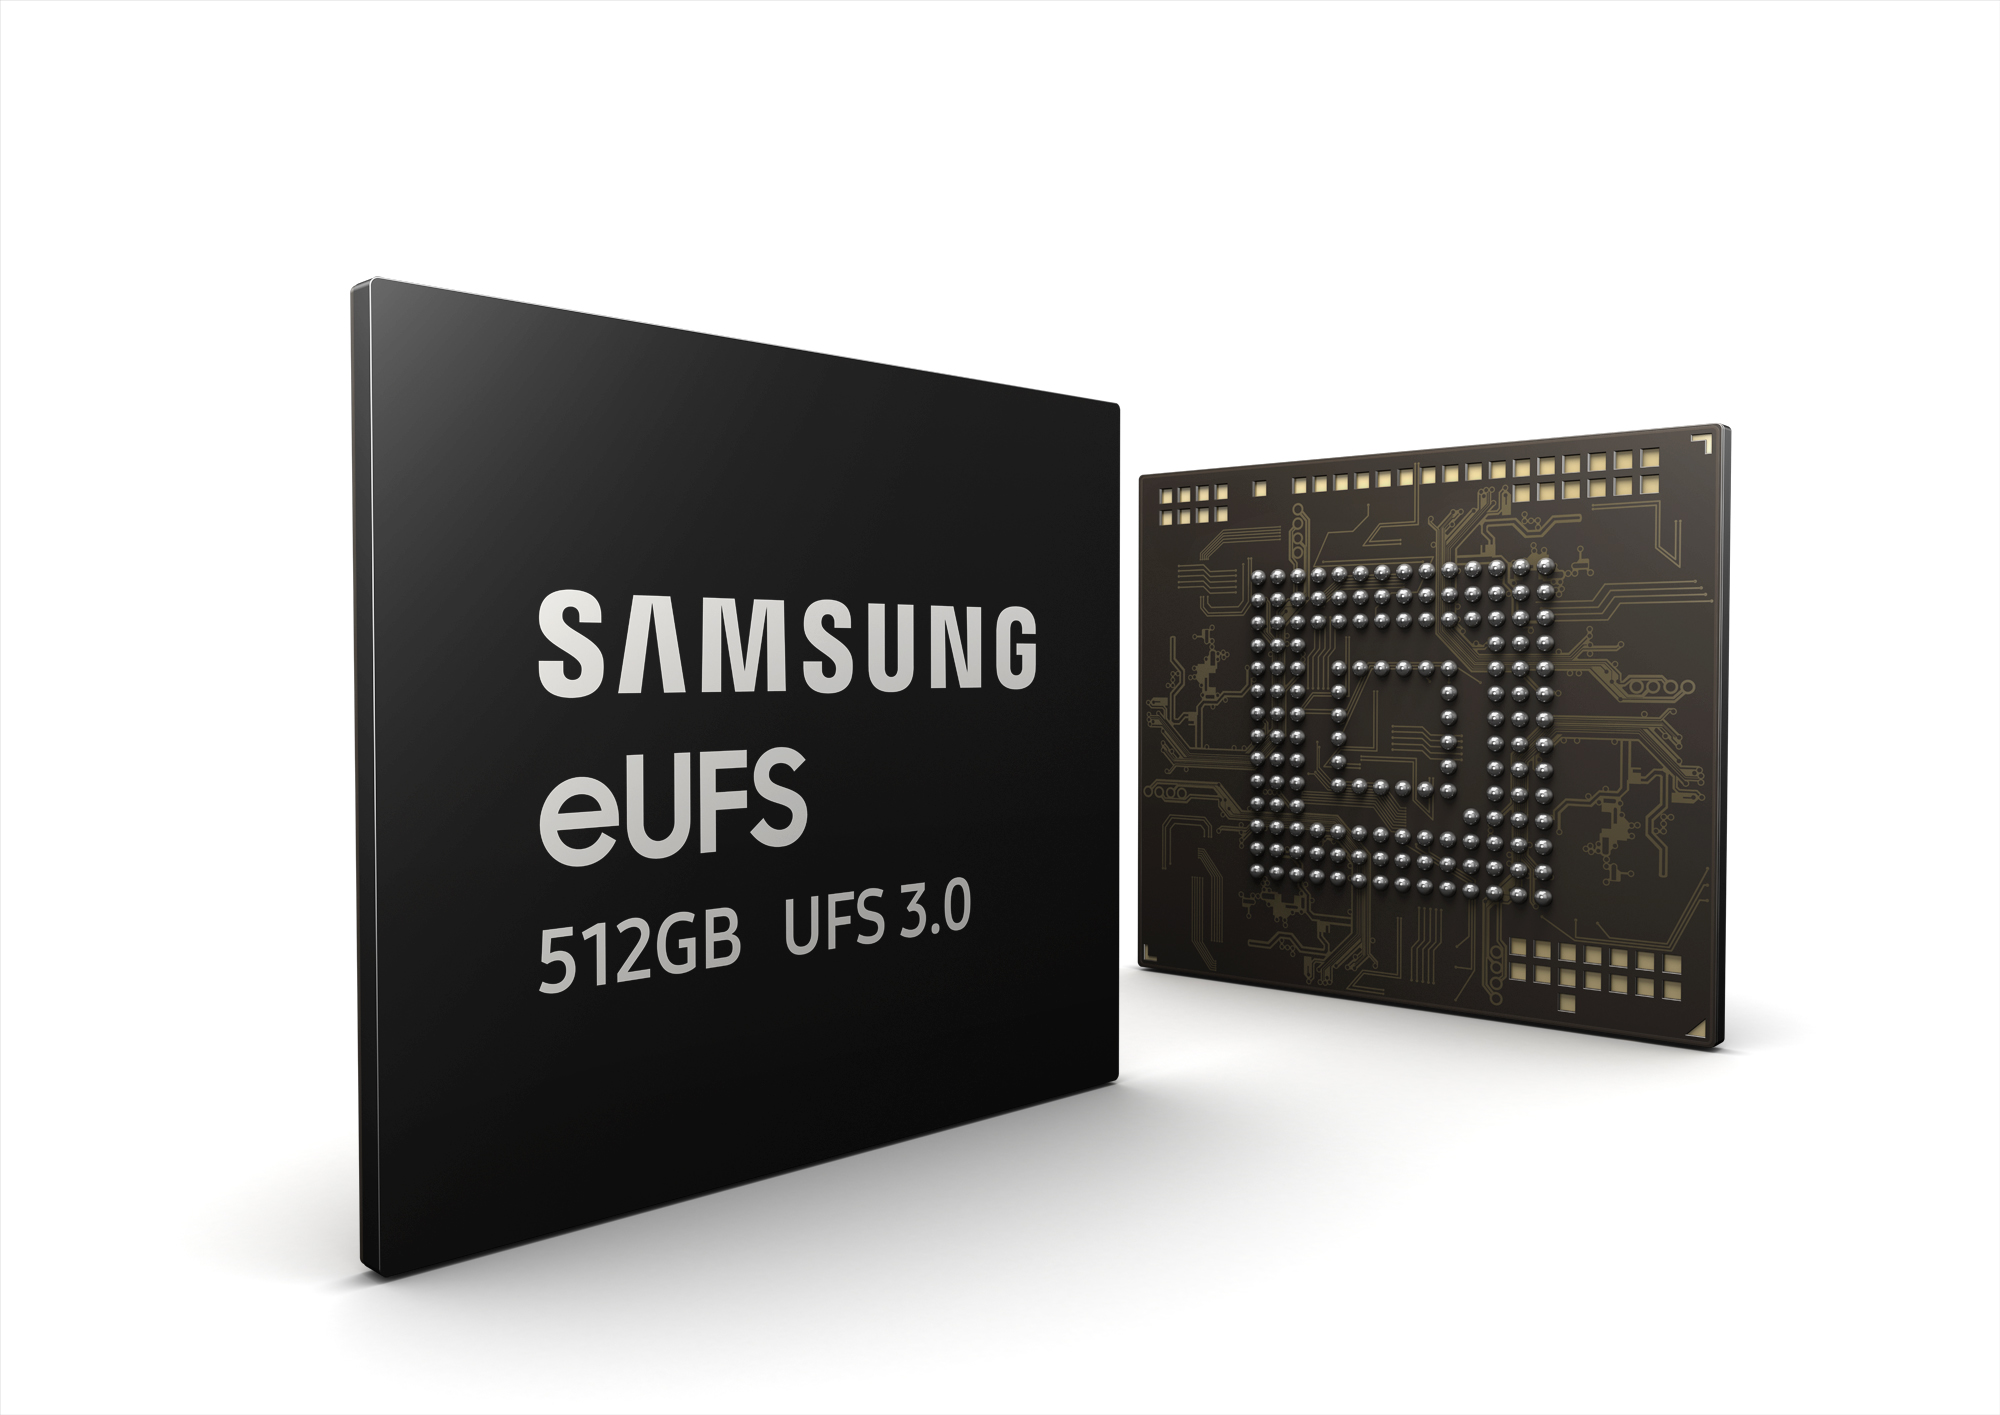 Samsung 512GB eUFS 3.0